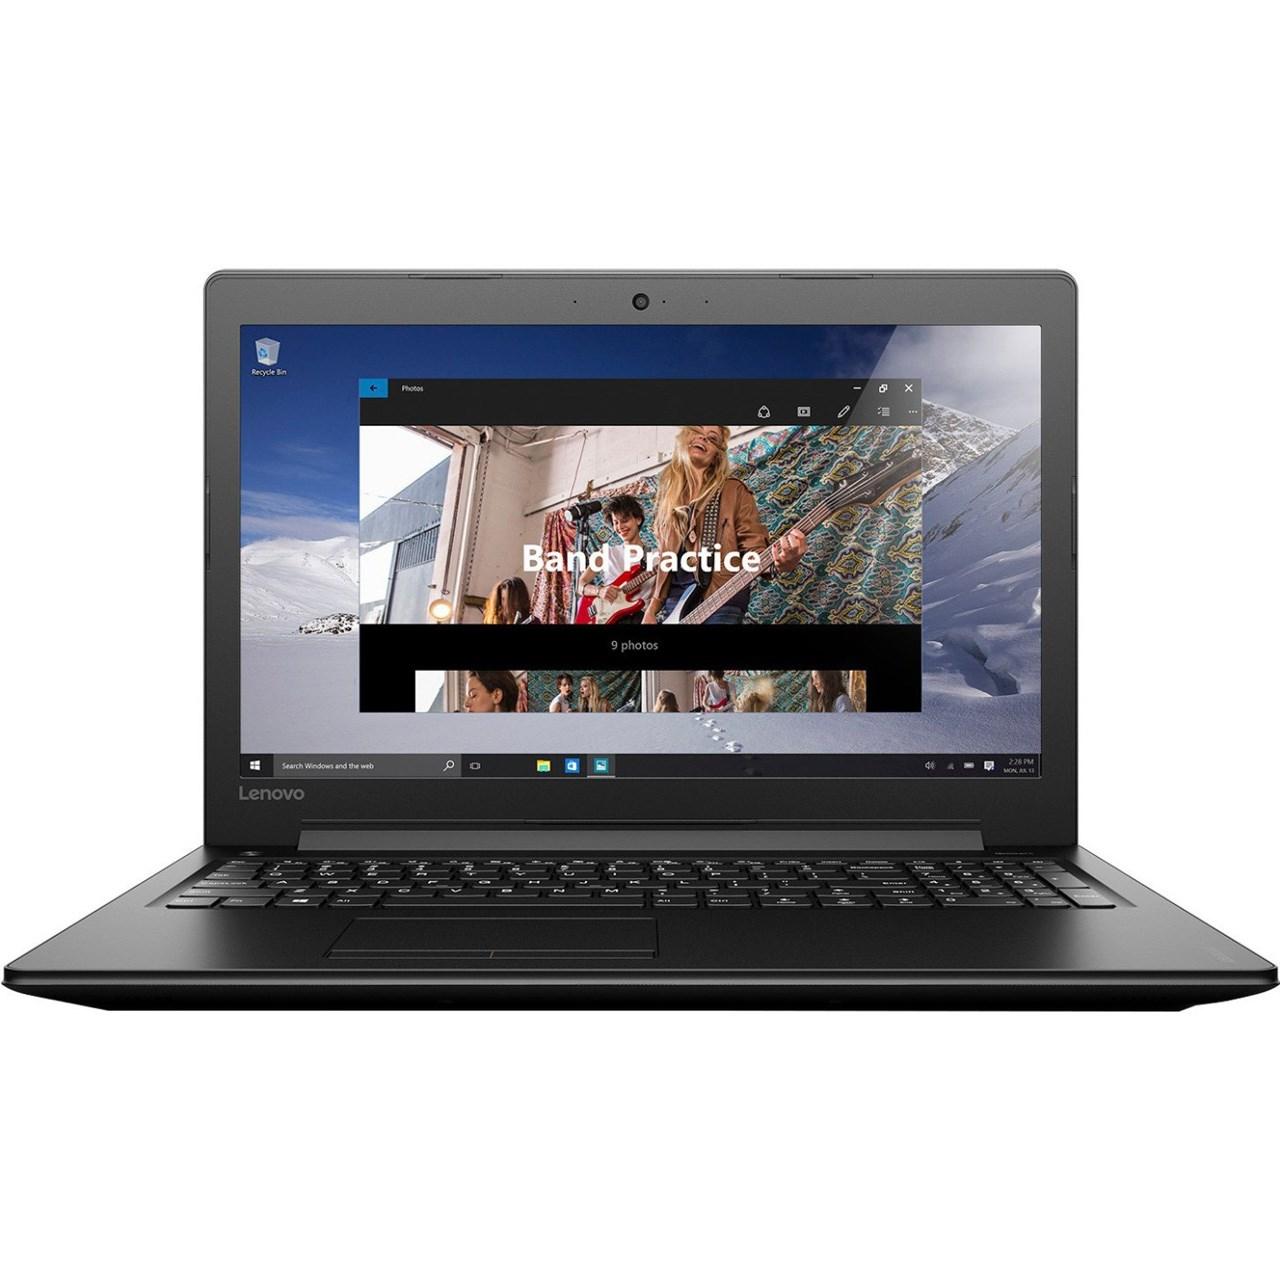 لپ تاپ 15 اینچی لنوو مدل Ideapad 310 - P